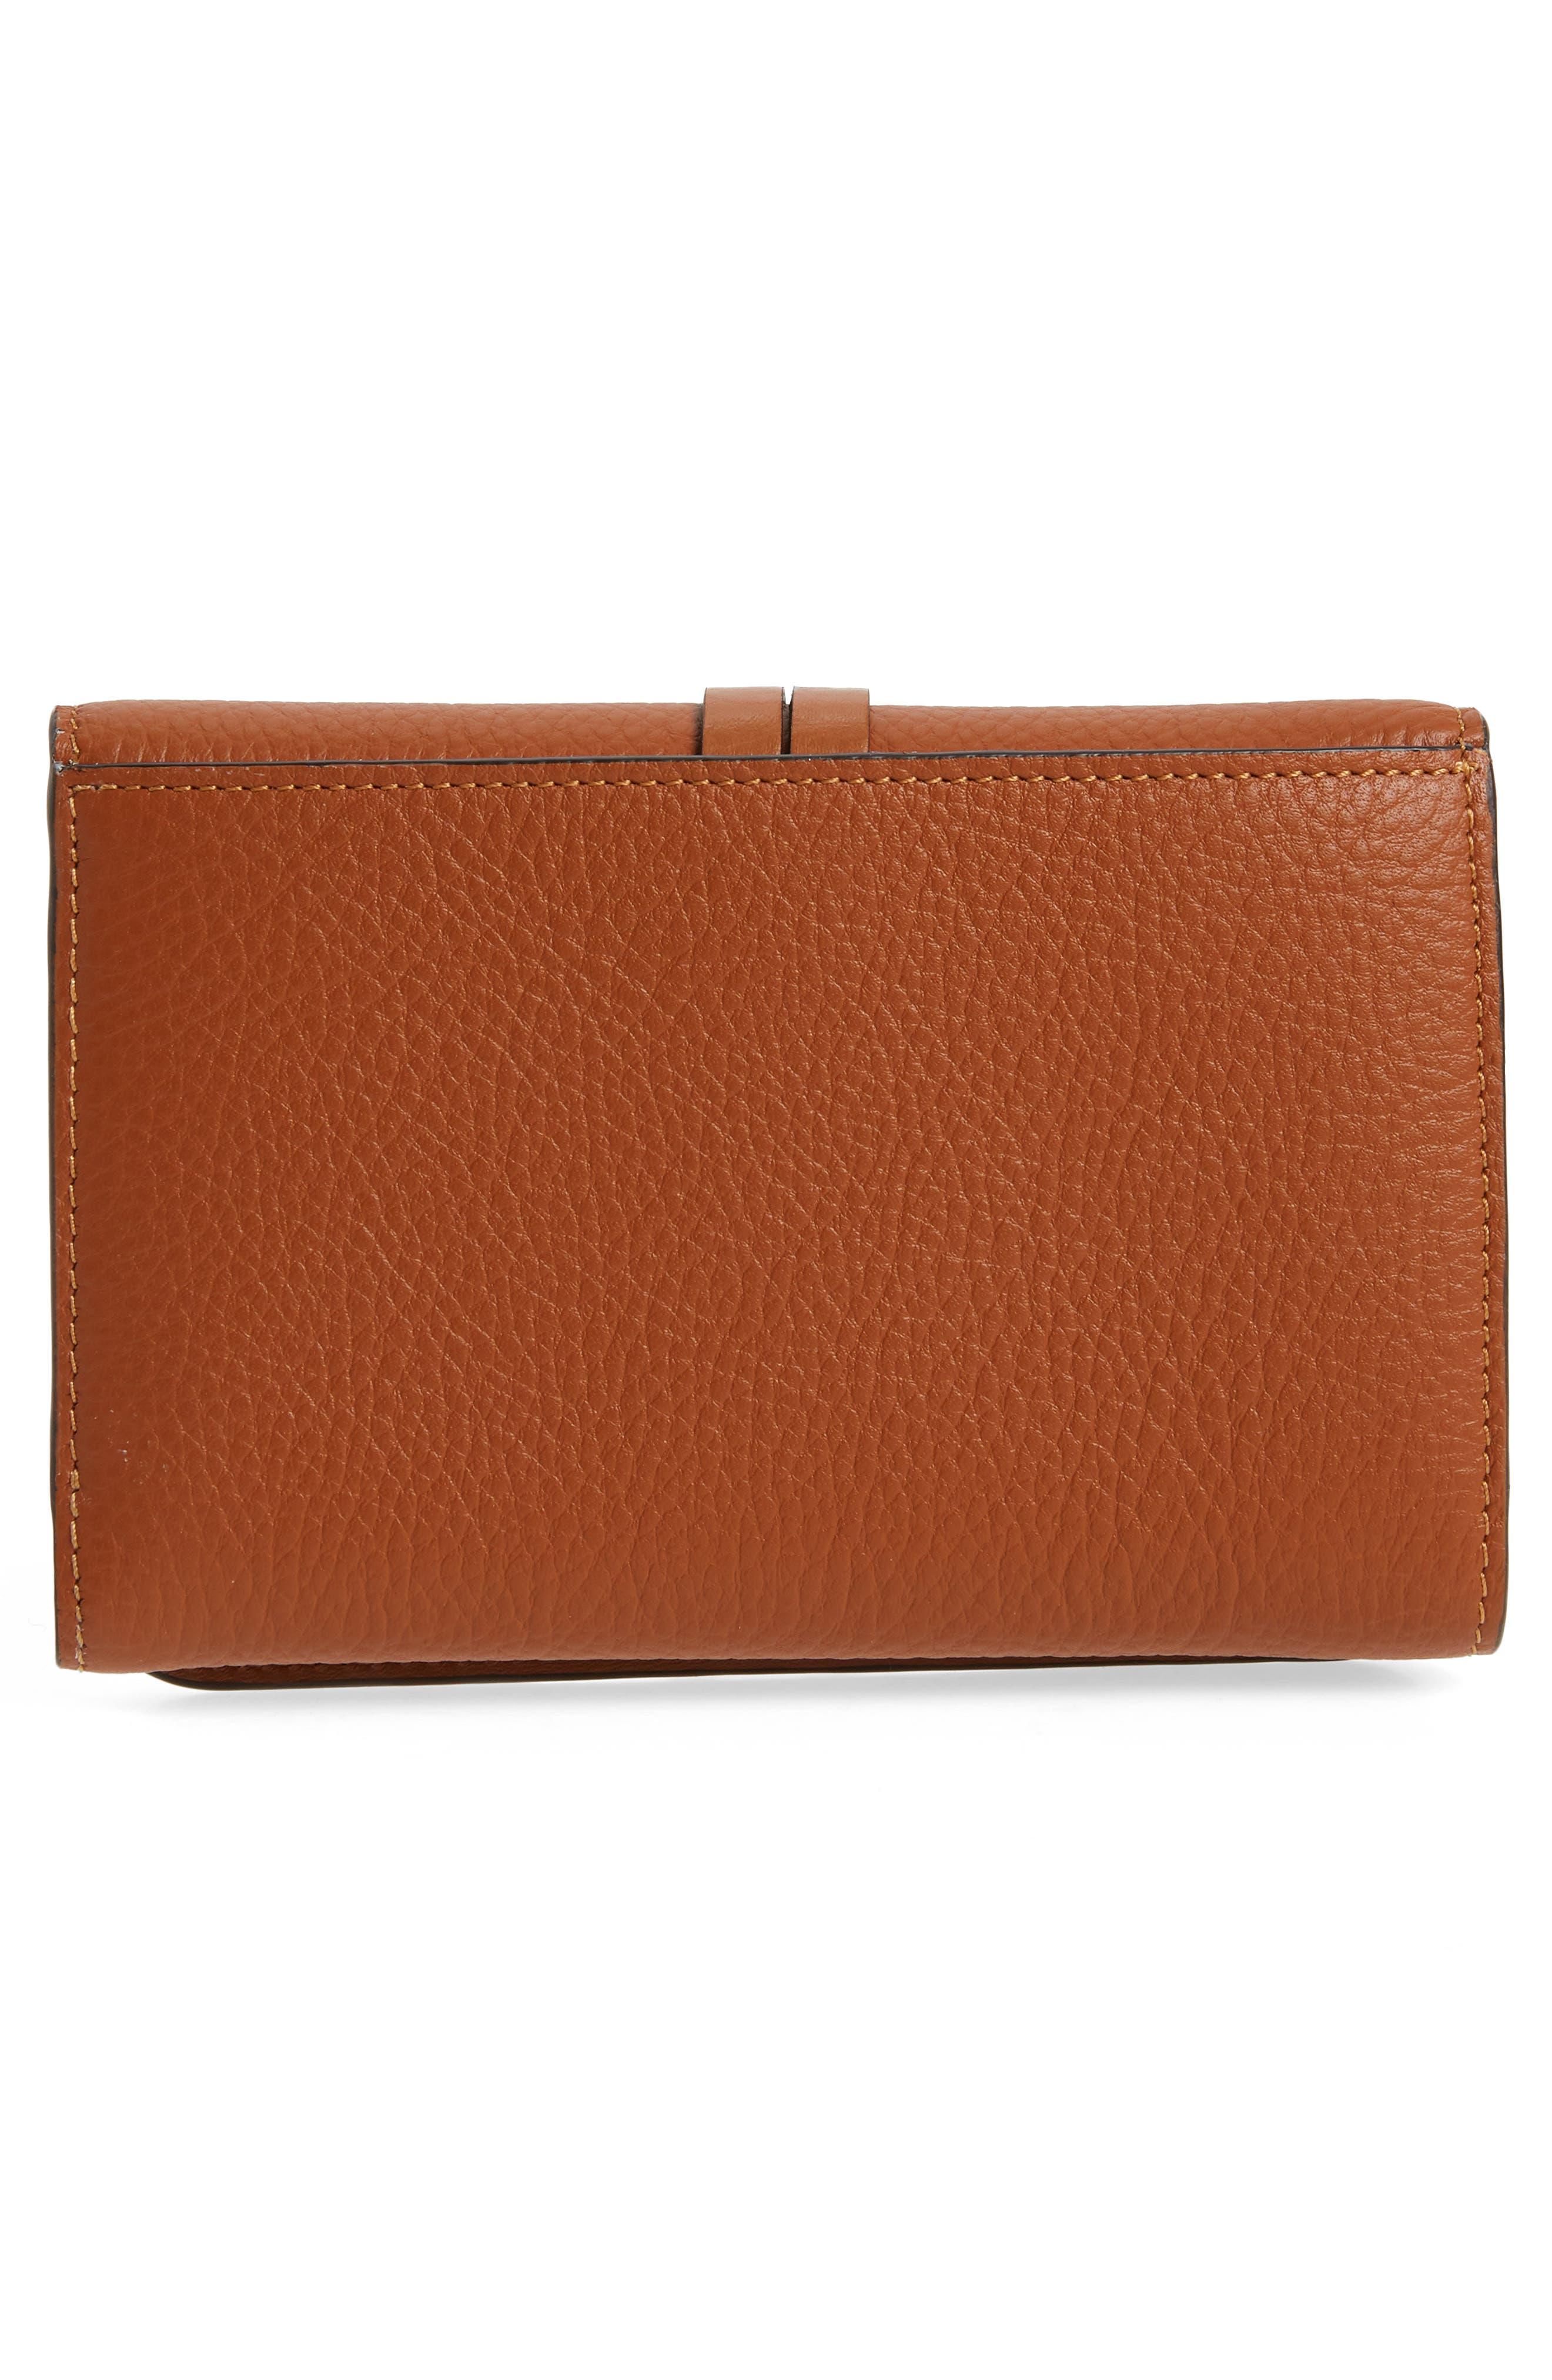 Alphabet Leather Wallet,                             Alternate thumbnail 4, color,                             Tan